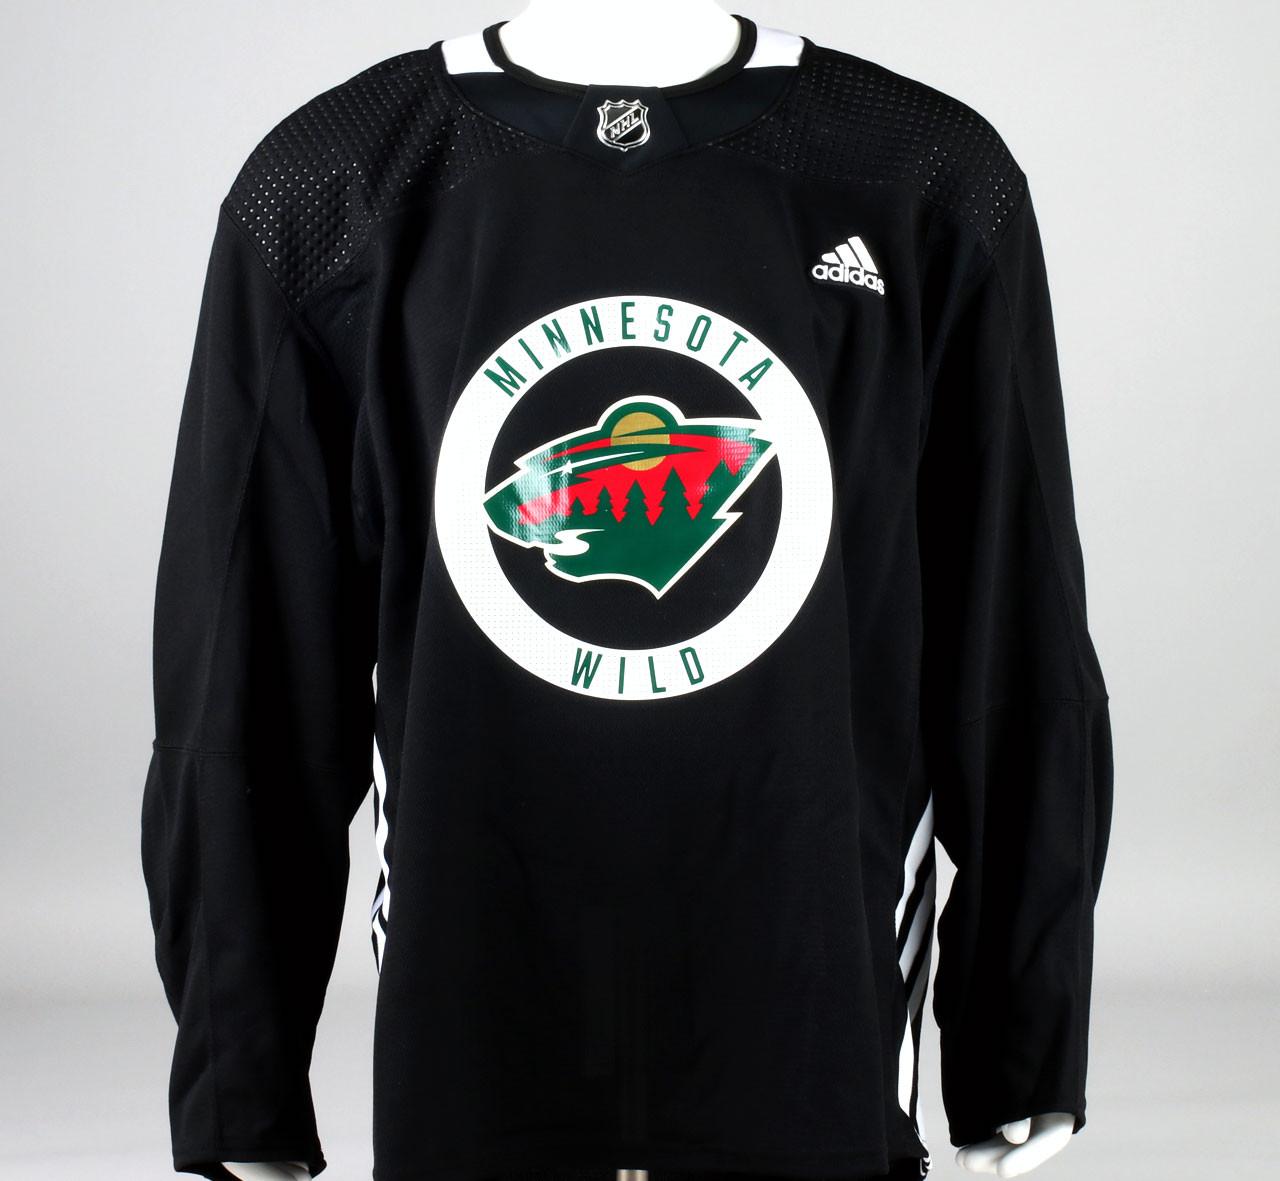 size 56 jersey